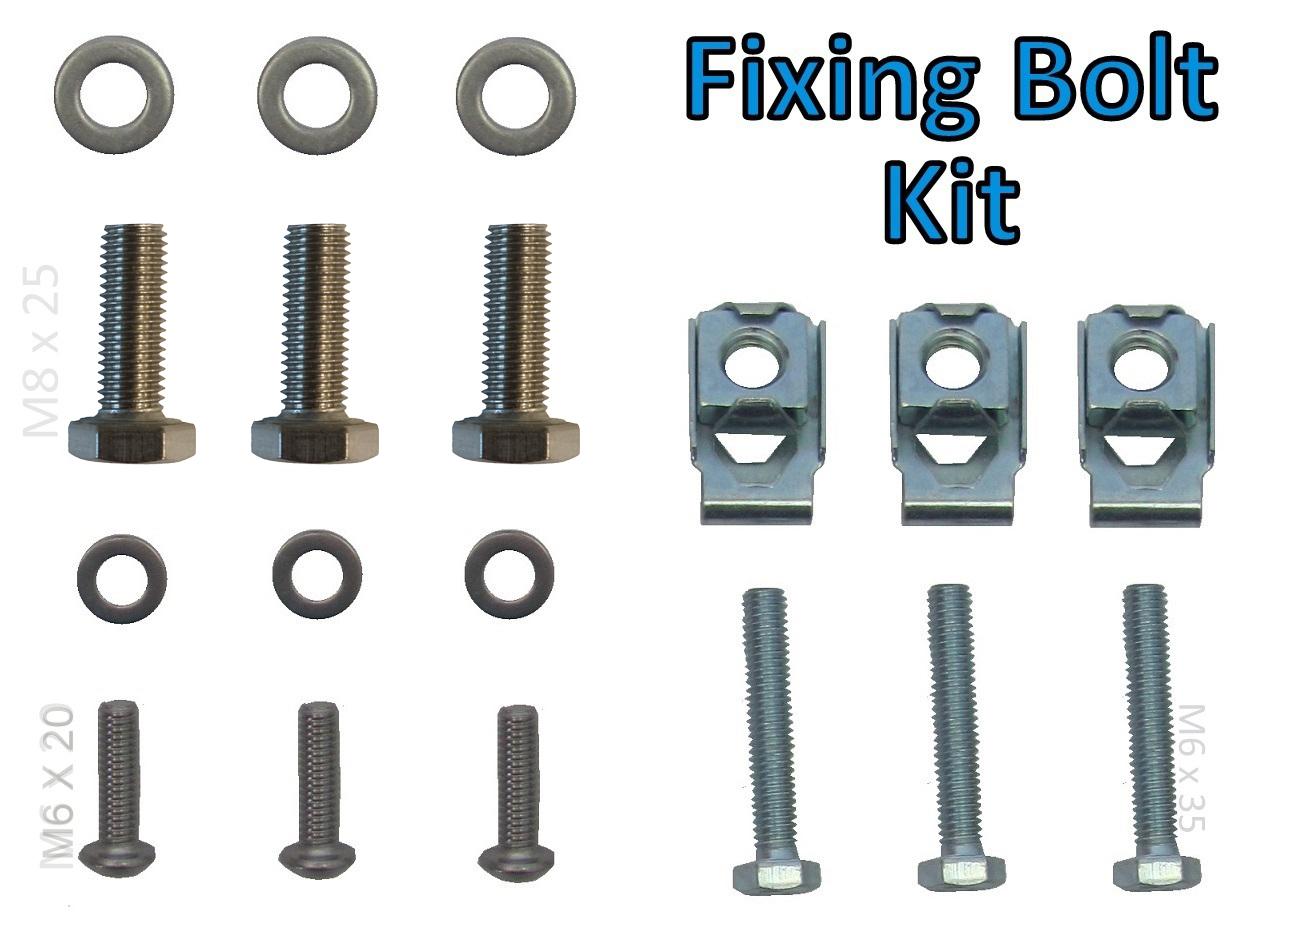 Air suspension compressor fixing bolt kit for Range Rover Sport nut fitting clip